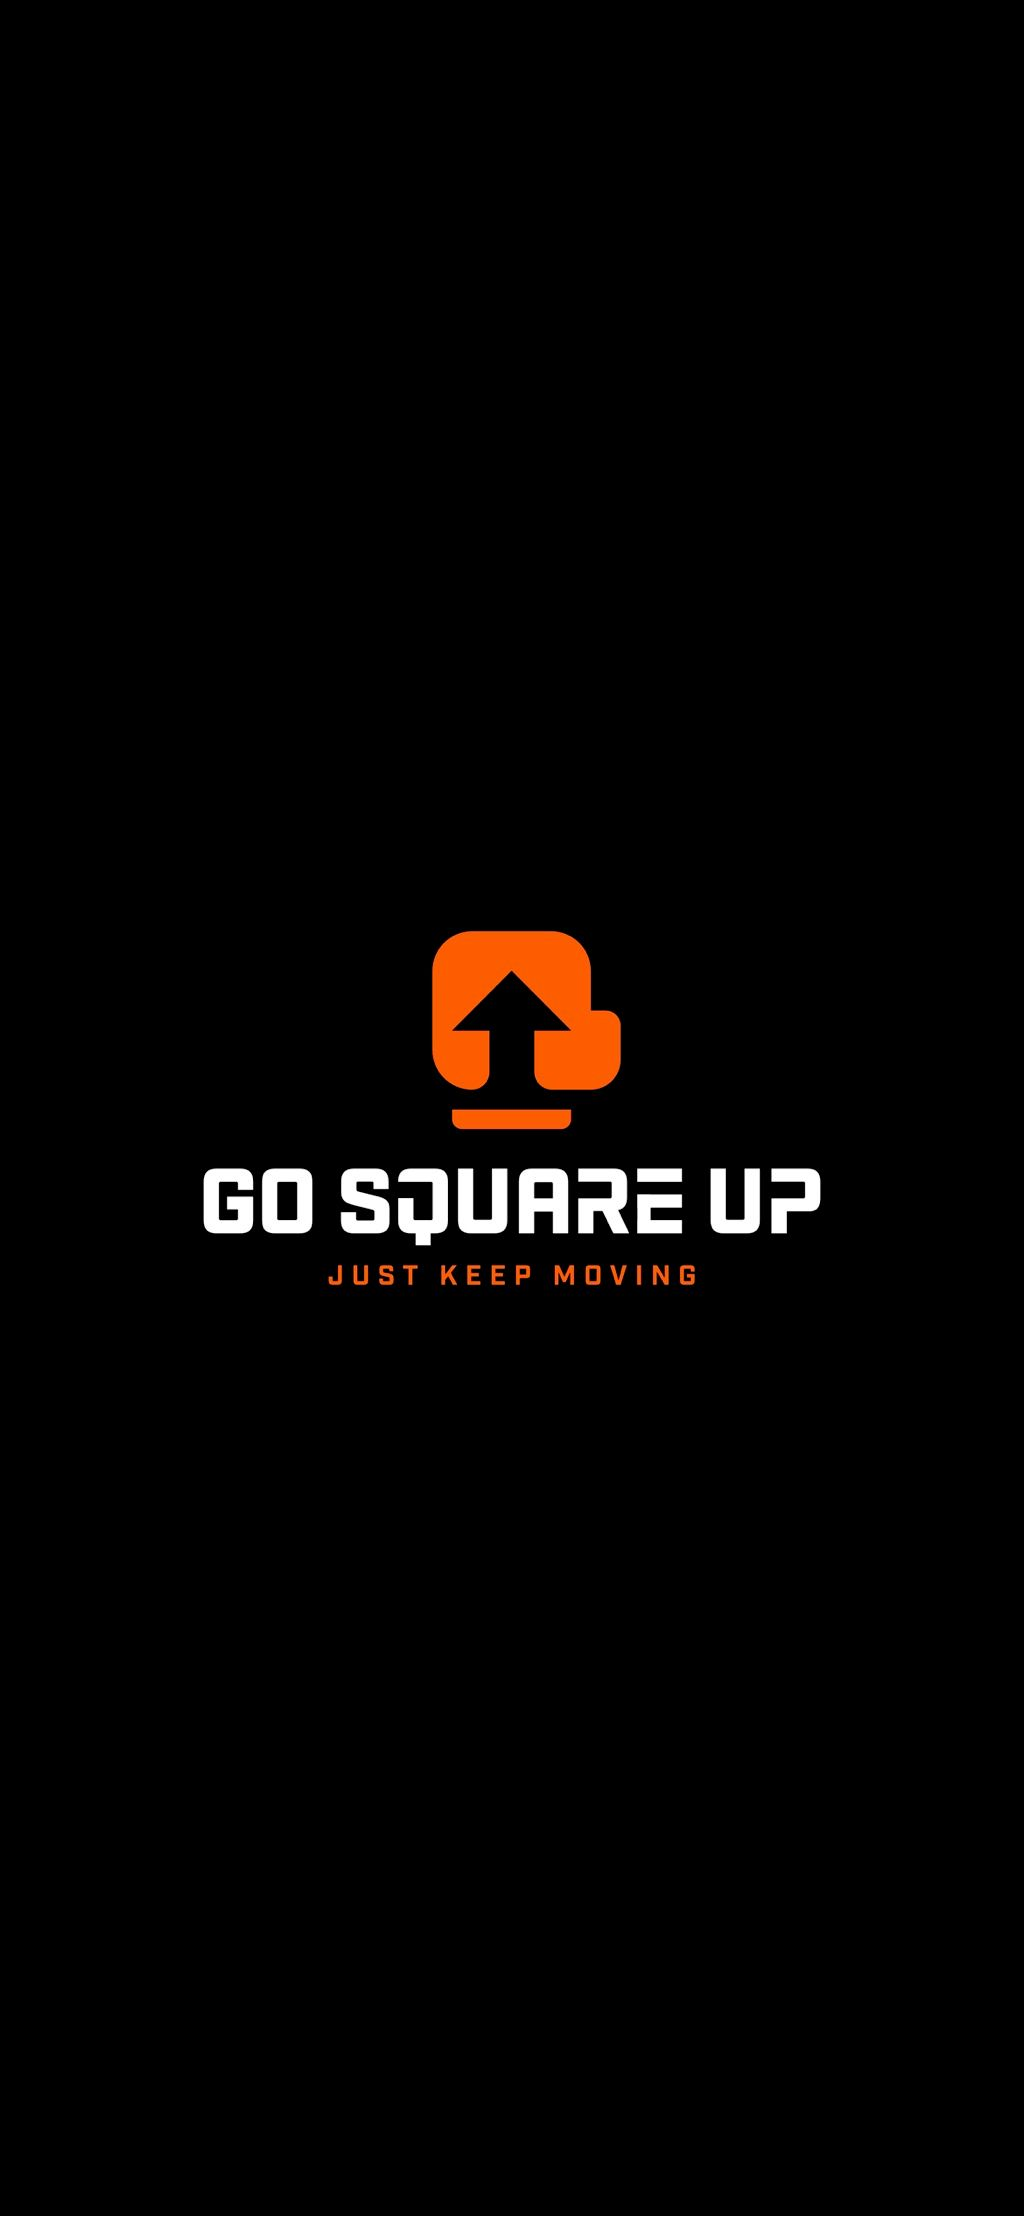 Go Square Up